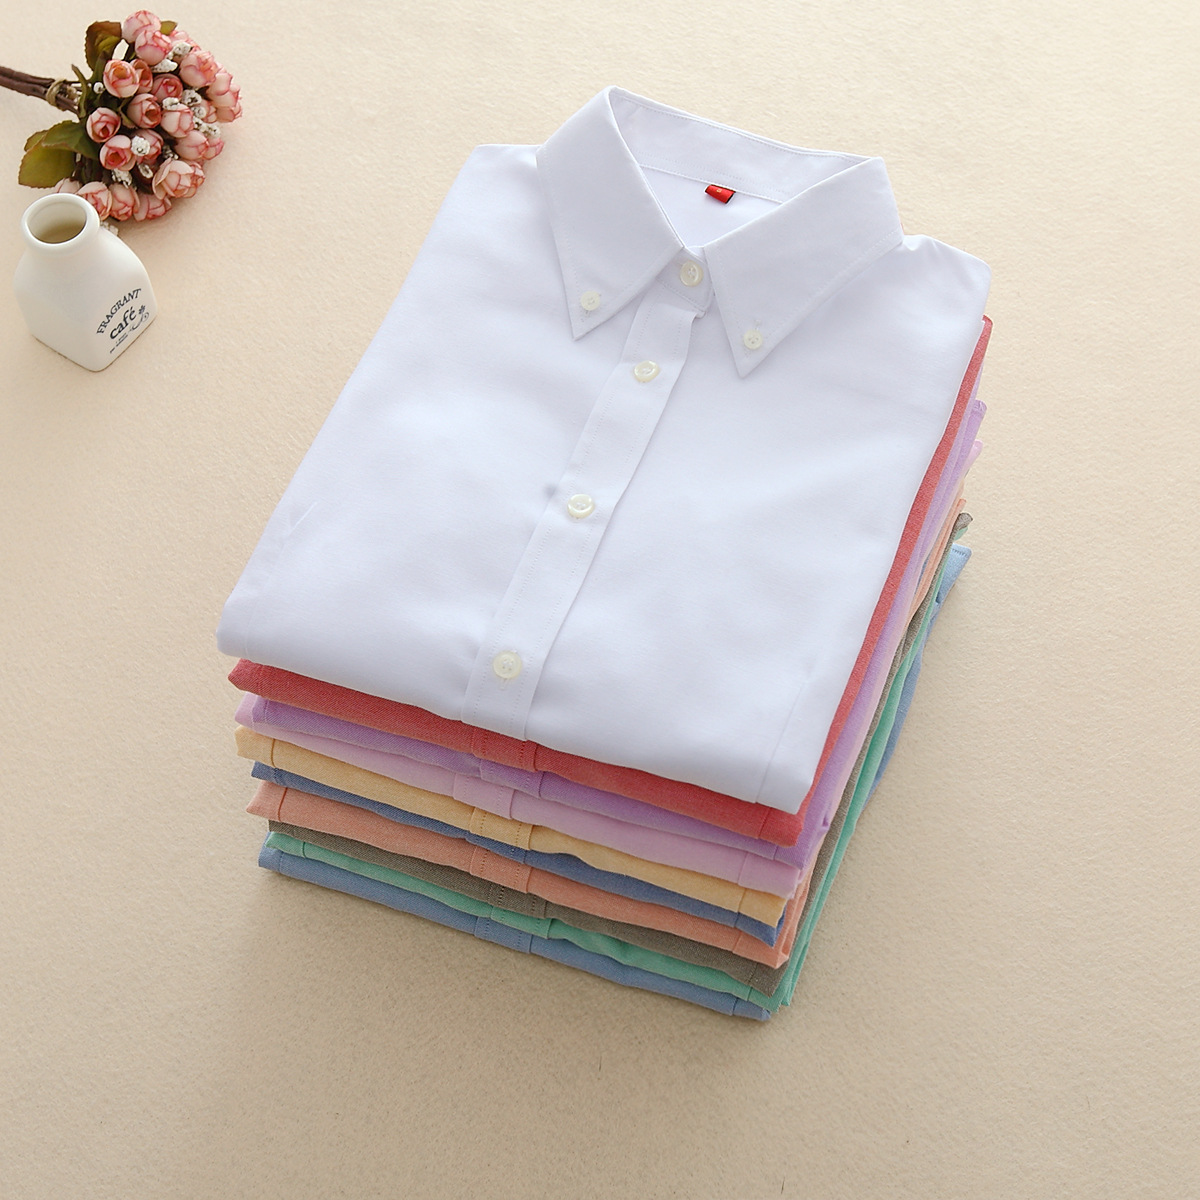 FEKEHA Women   Blouses   2019 Long Sleeve Oxford Ladies Tops Office Long Sleeve   Shirts   Women Student Blusas Camisas Mujer